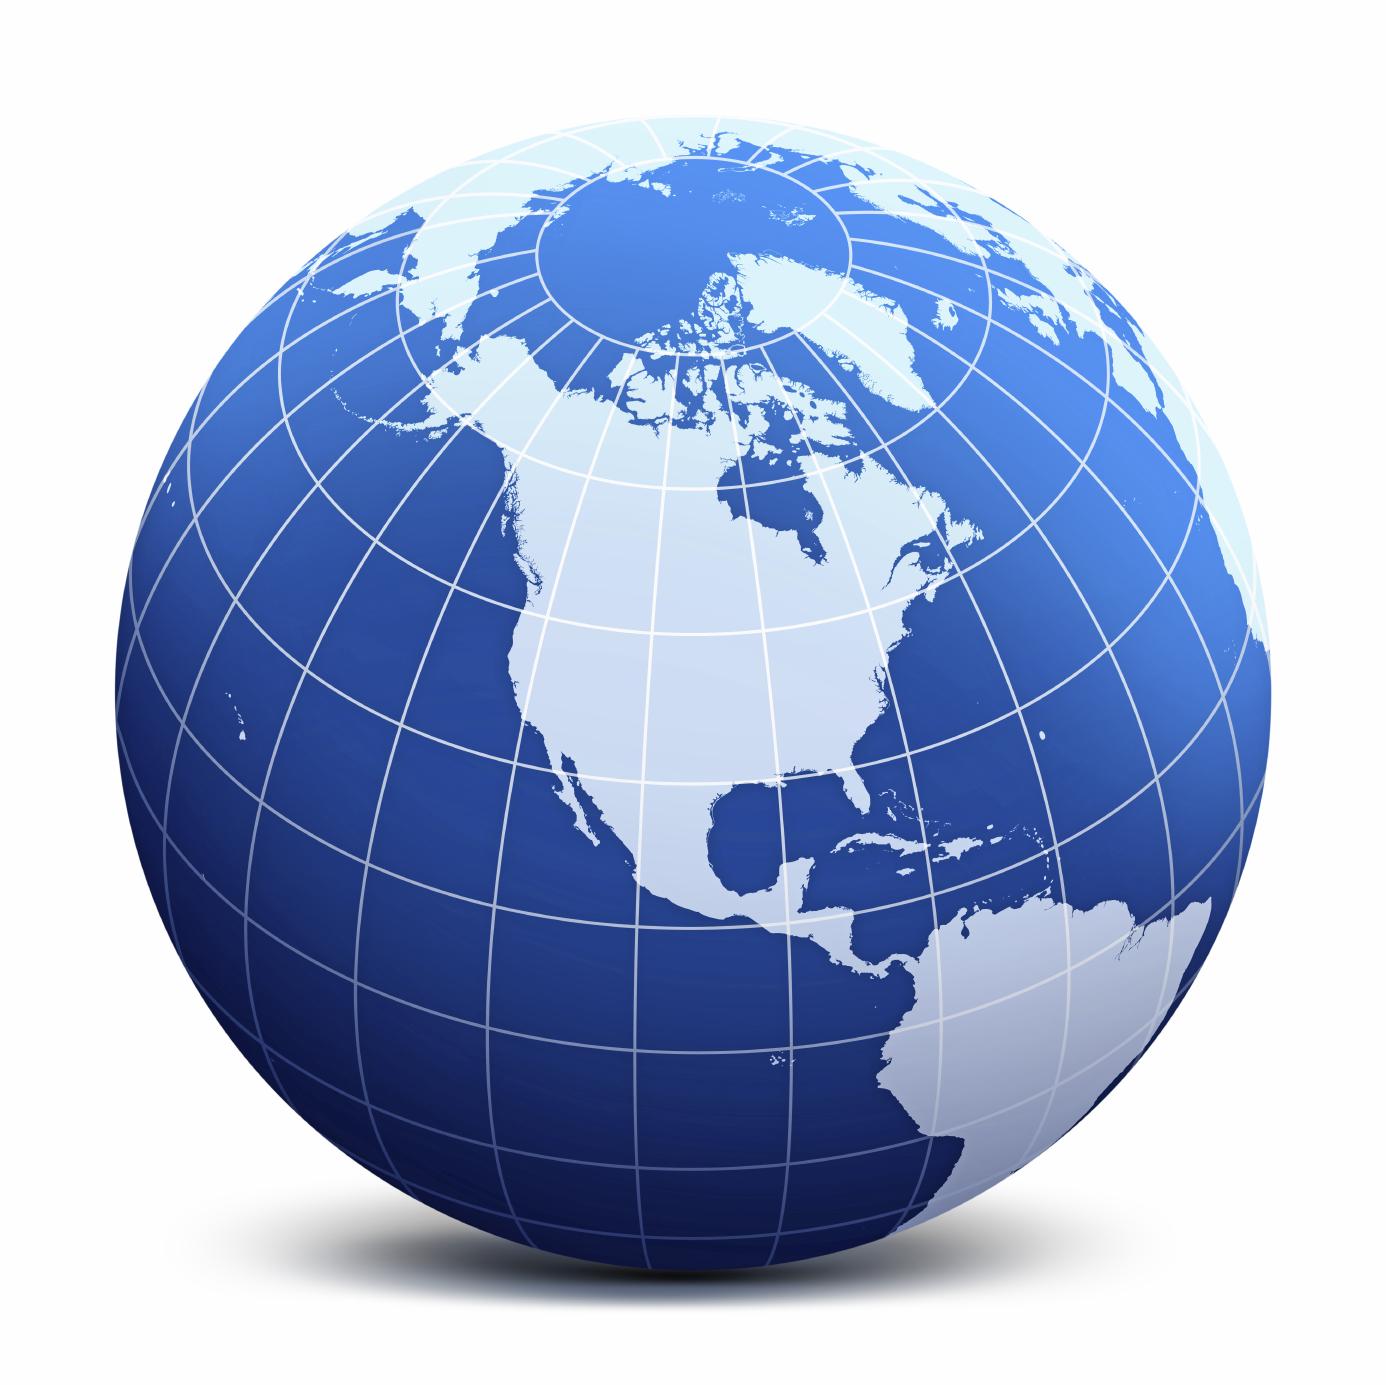 hight resolution of world globe logo courseimage